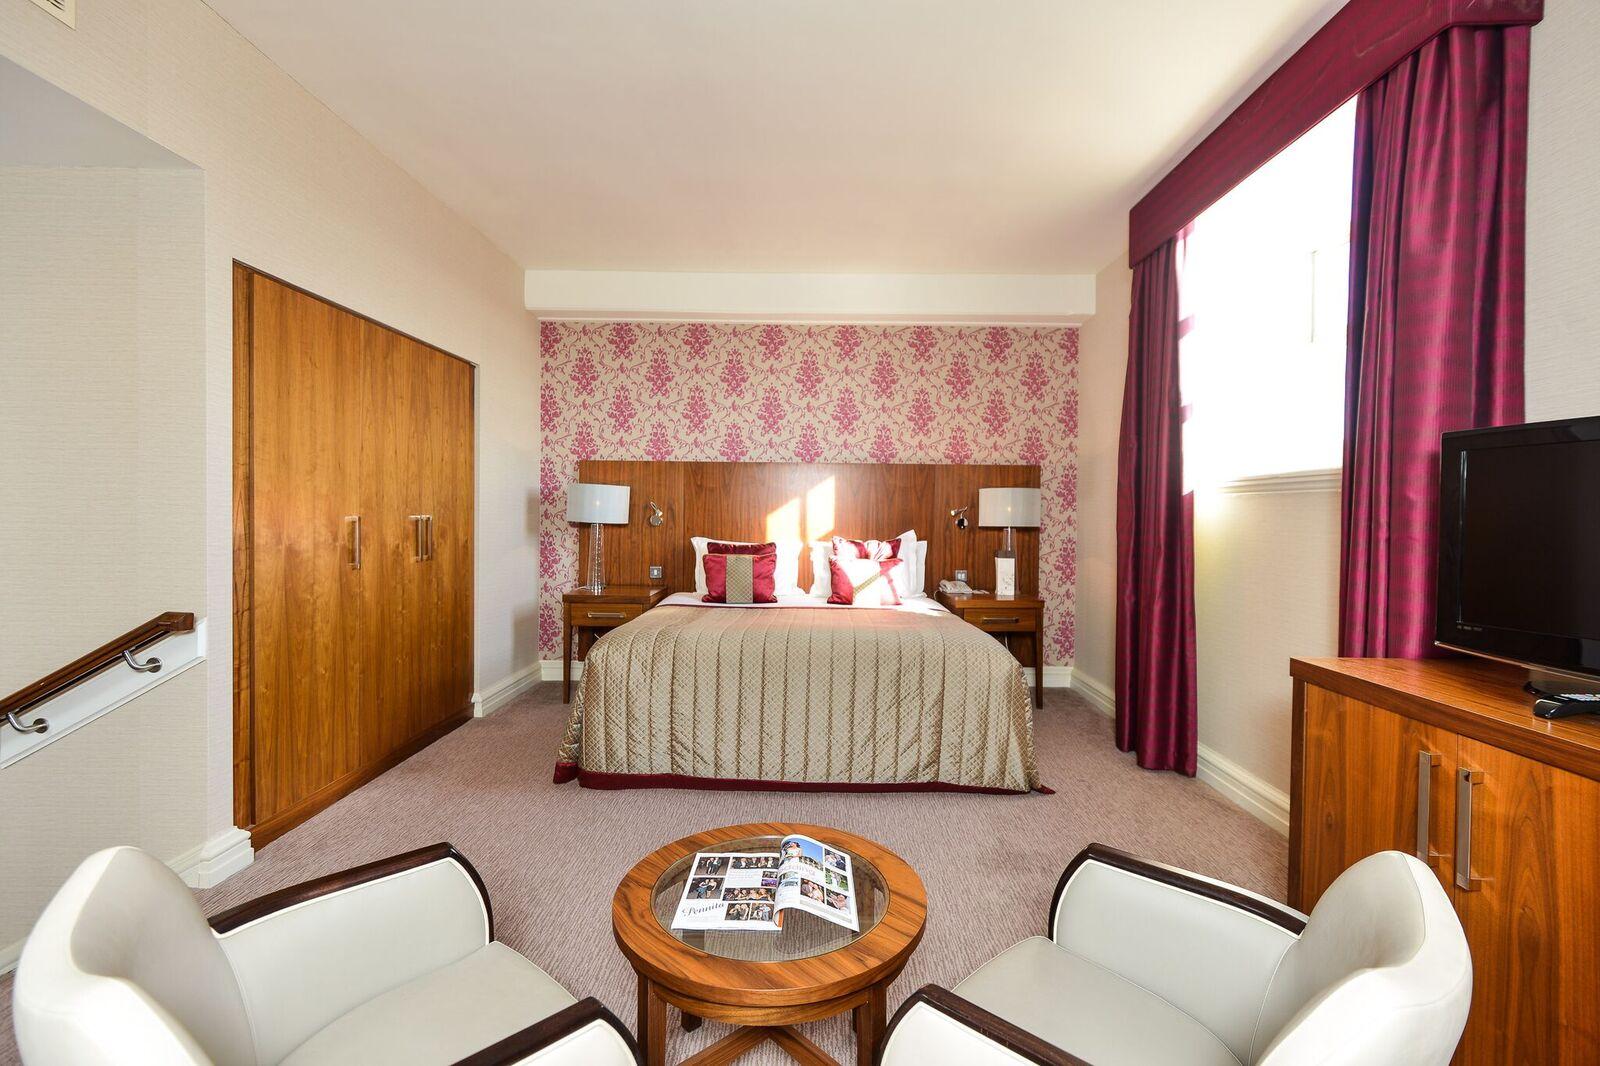 The Grand Hotel & Spa in York 2